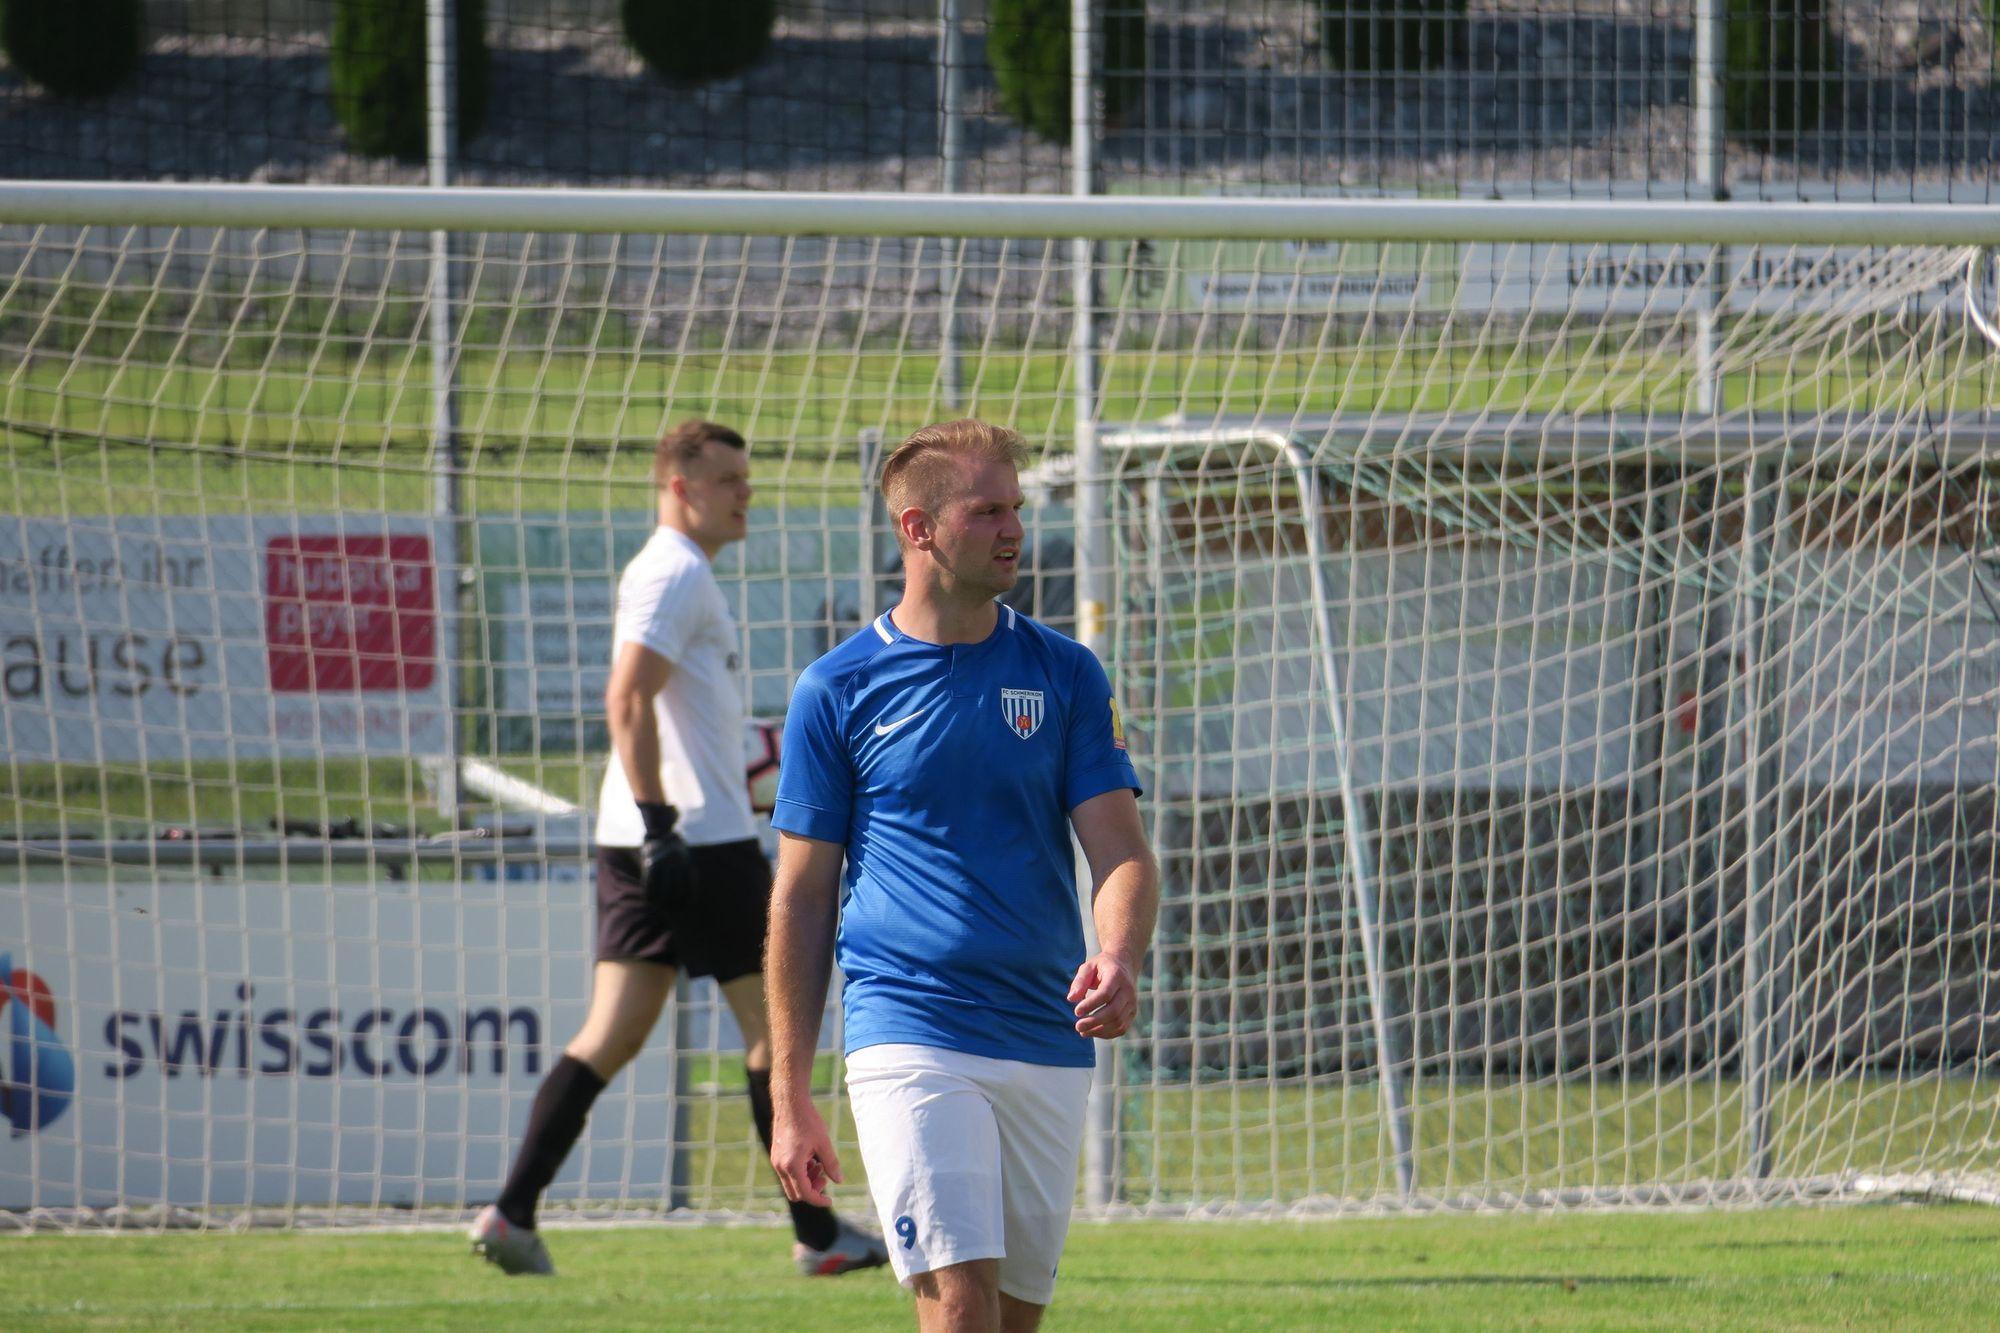 Sandro Vigini am 26.07.2021 gegen den FC Eschenbach (Foto: Thomas Müller, 8716.ch)